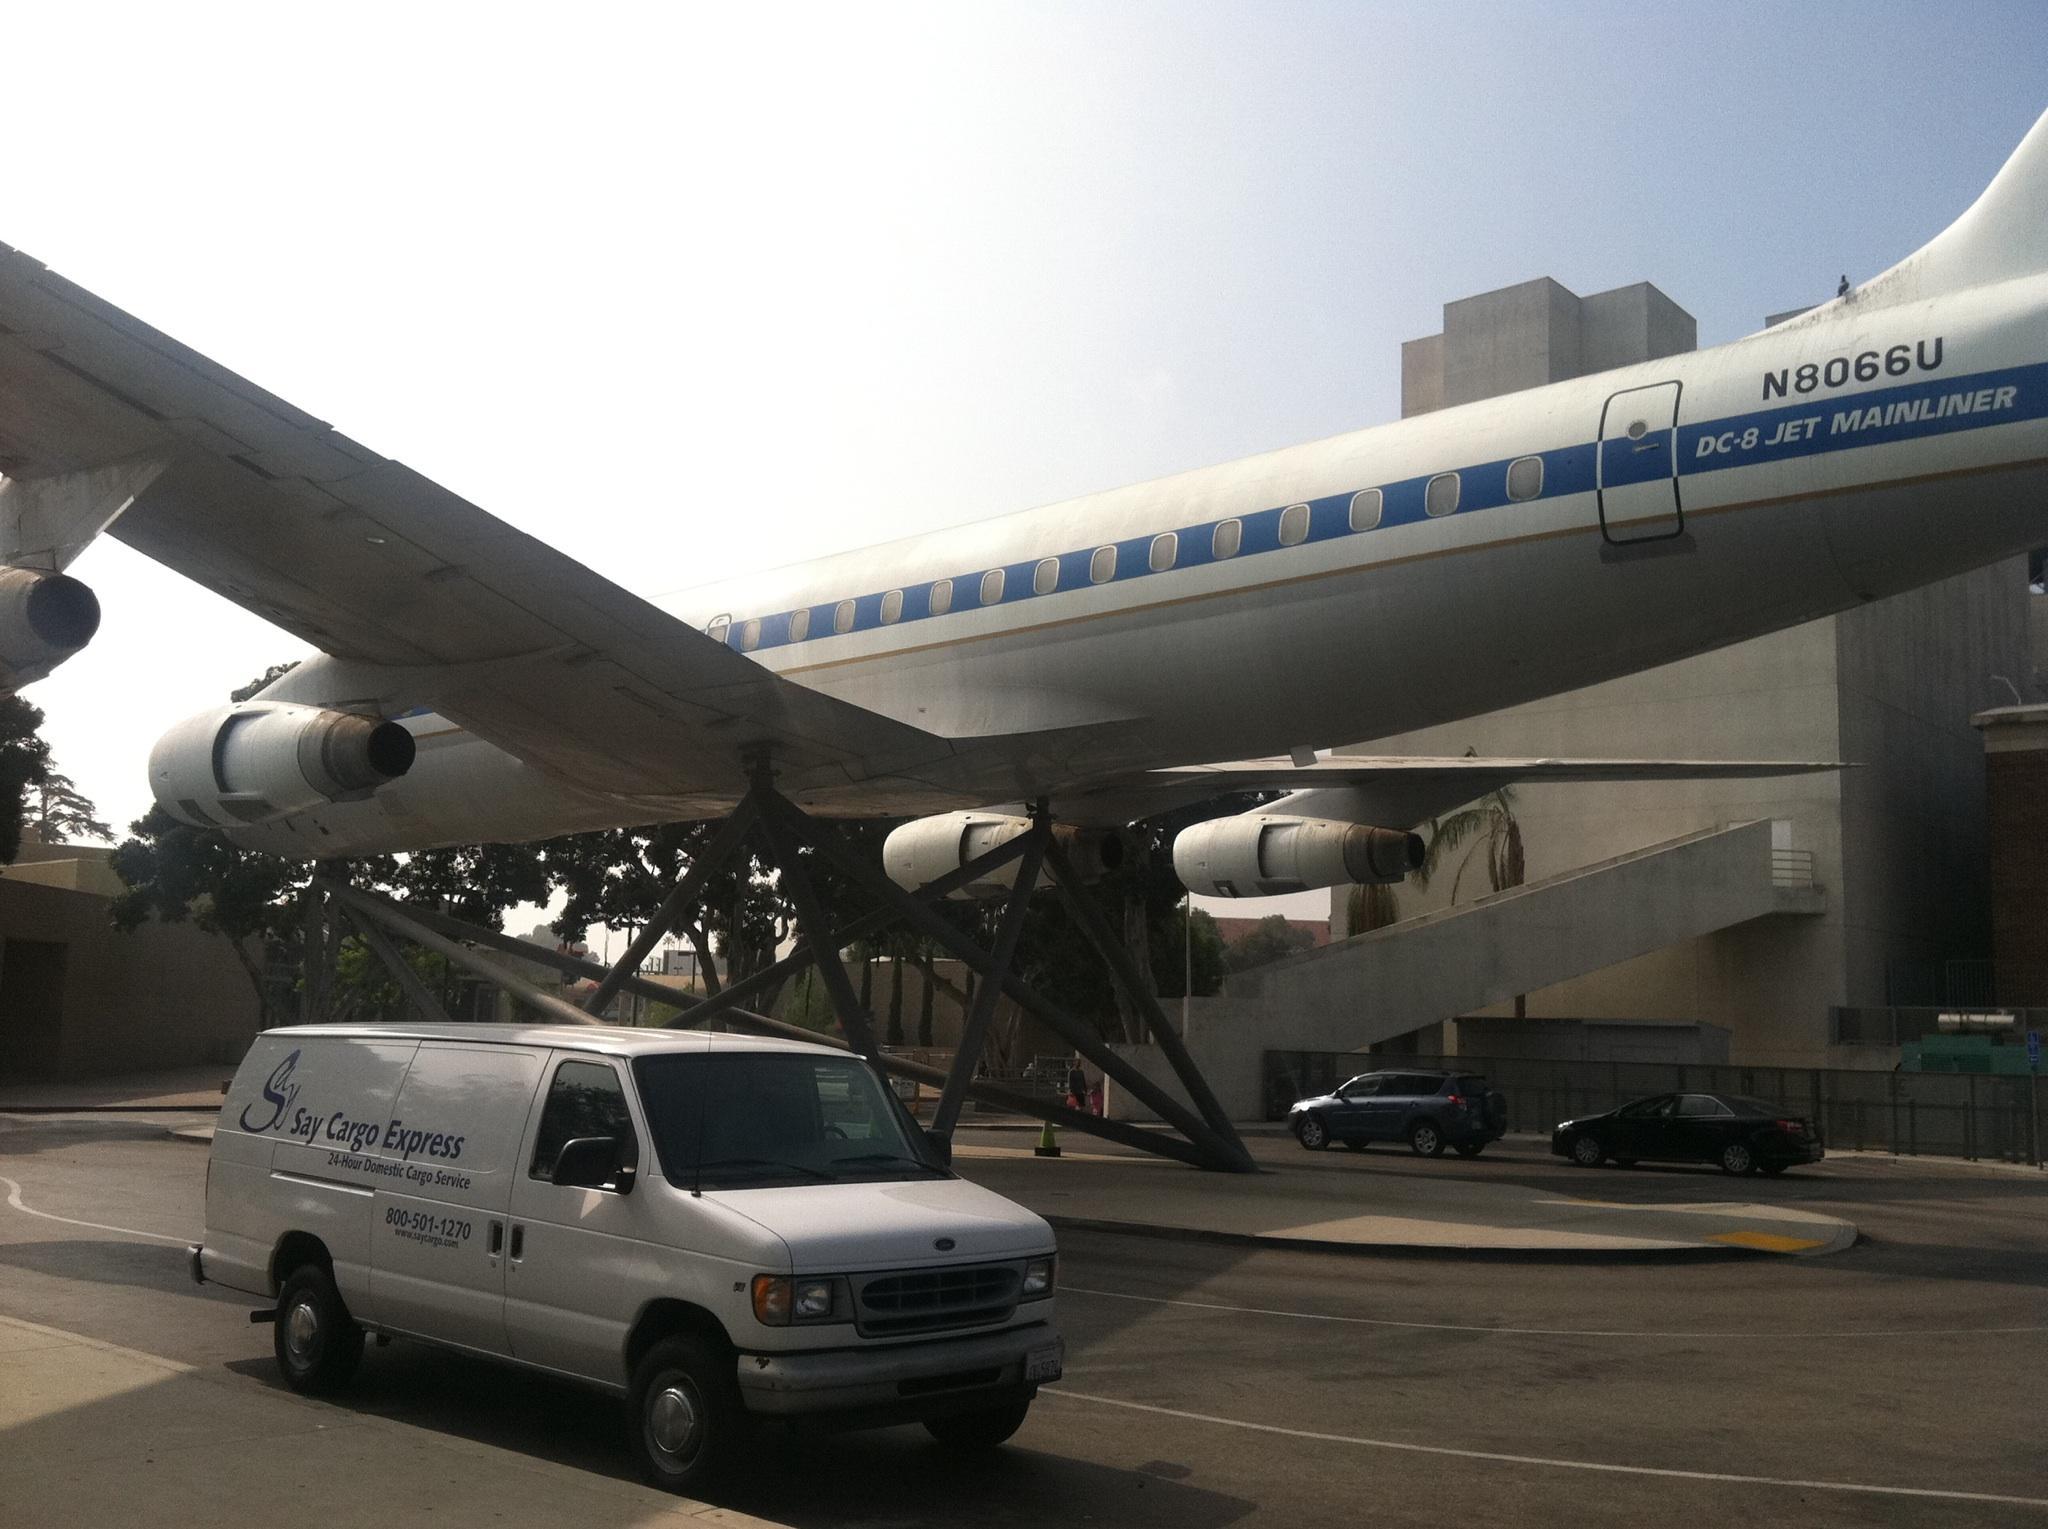 Say Cargo Express Van at California Science Center